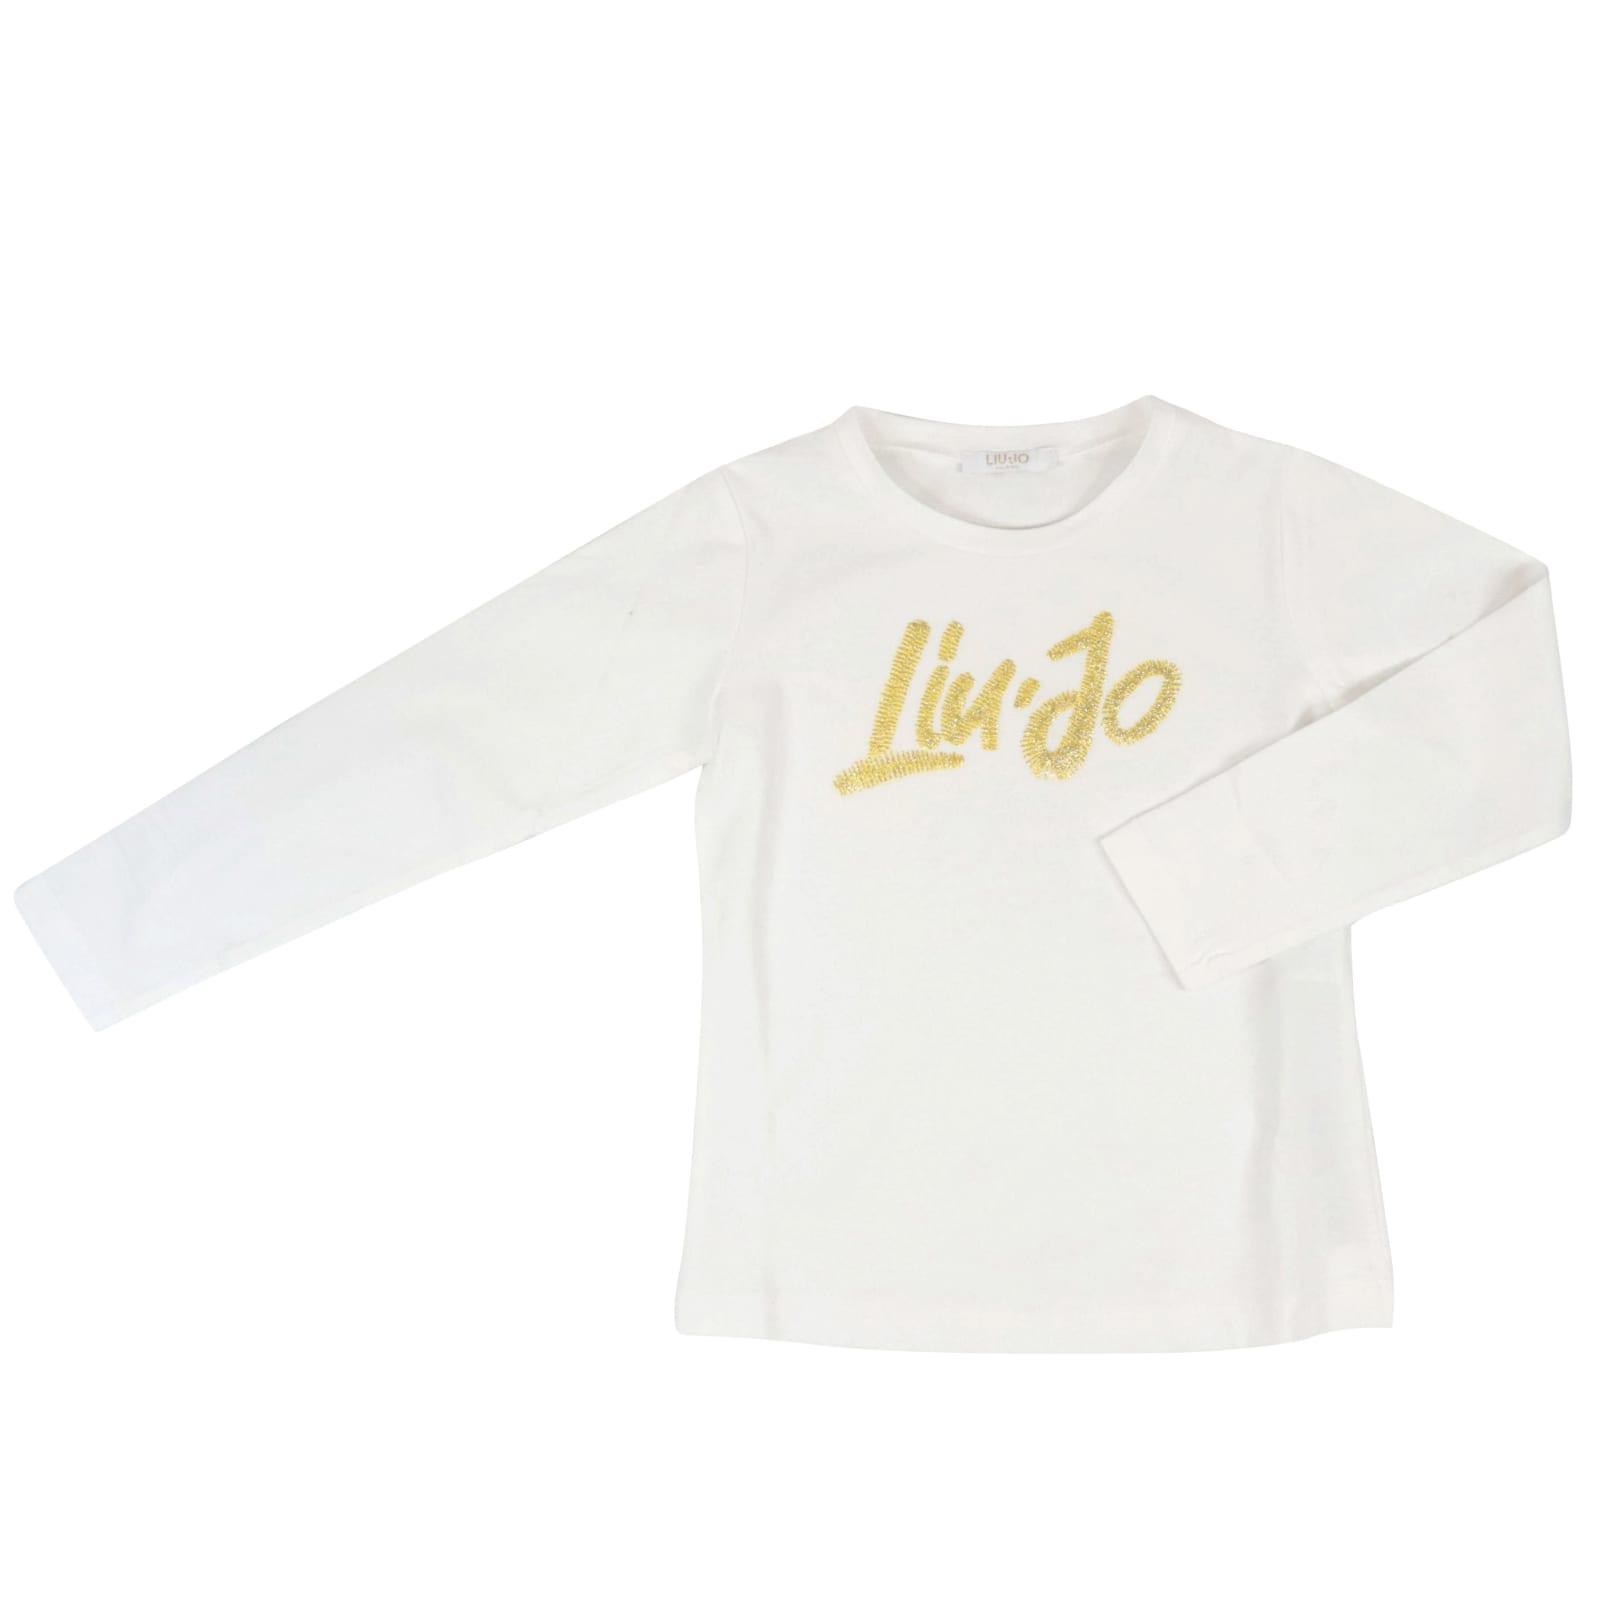 Liu •jo Kids' Cotton T-shirt In White